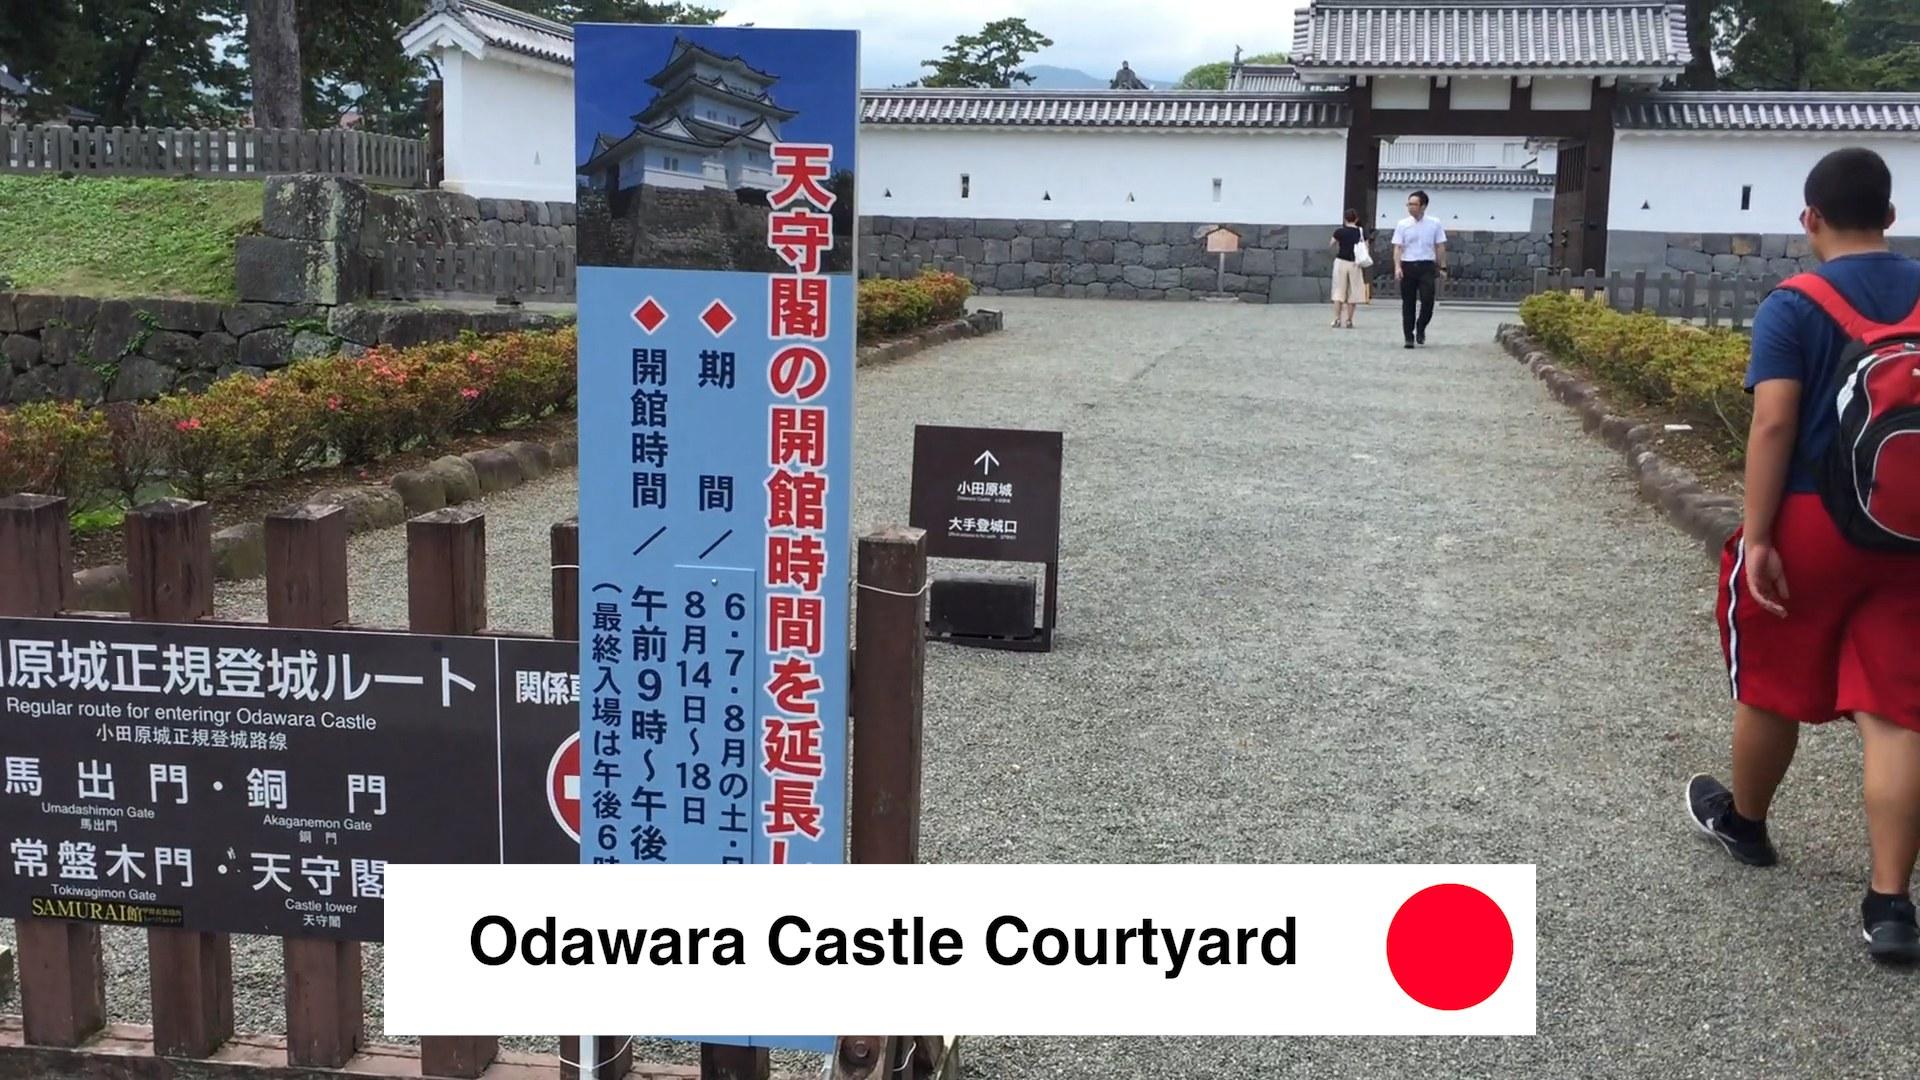 Odawara Castle Courtyard - Odawara Castle Japan Guide Review Video - 9 Reasons To See Odawara Castle Kanagawa Japan 🇯🇵 🏯 🌸